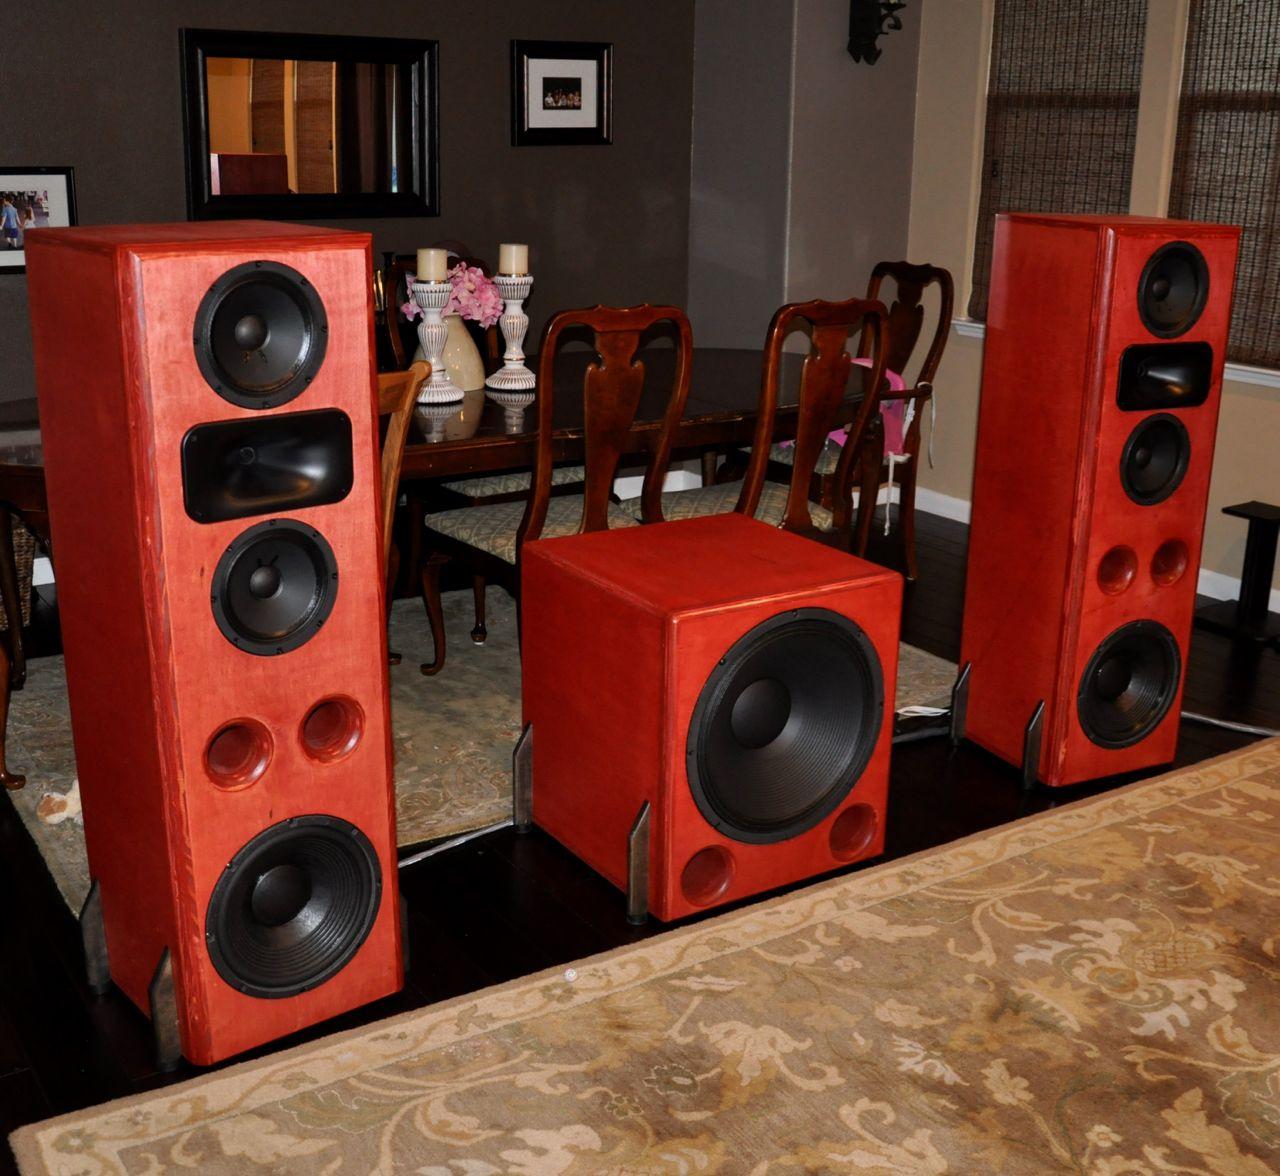 Sfe 812 Pro Audio Reference Speakers Home Audio Speakers Audio